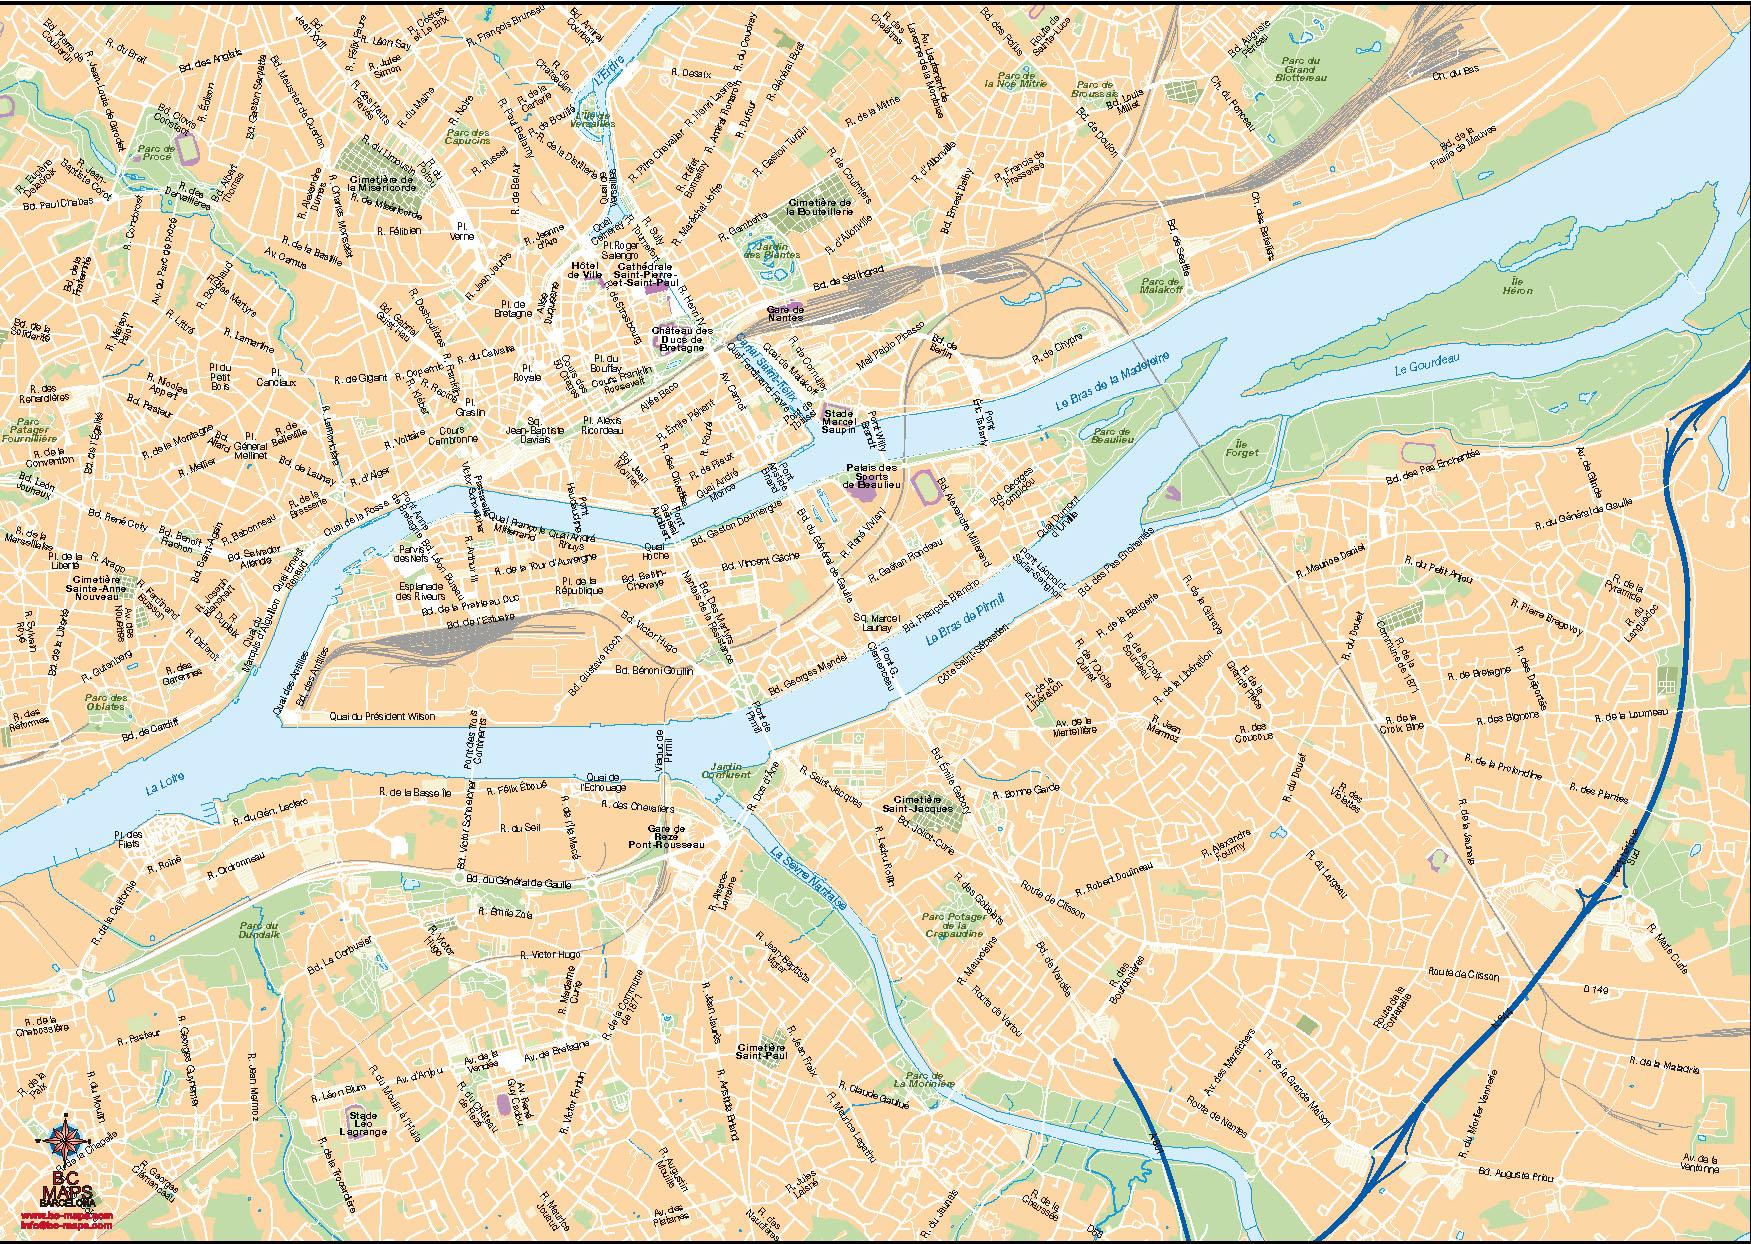 Nantes plan de ville fond de carte vectoriel illustrator ai eps